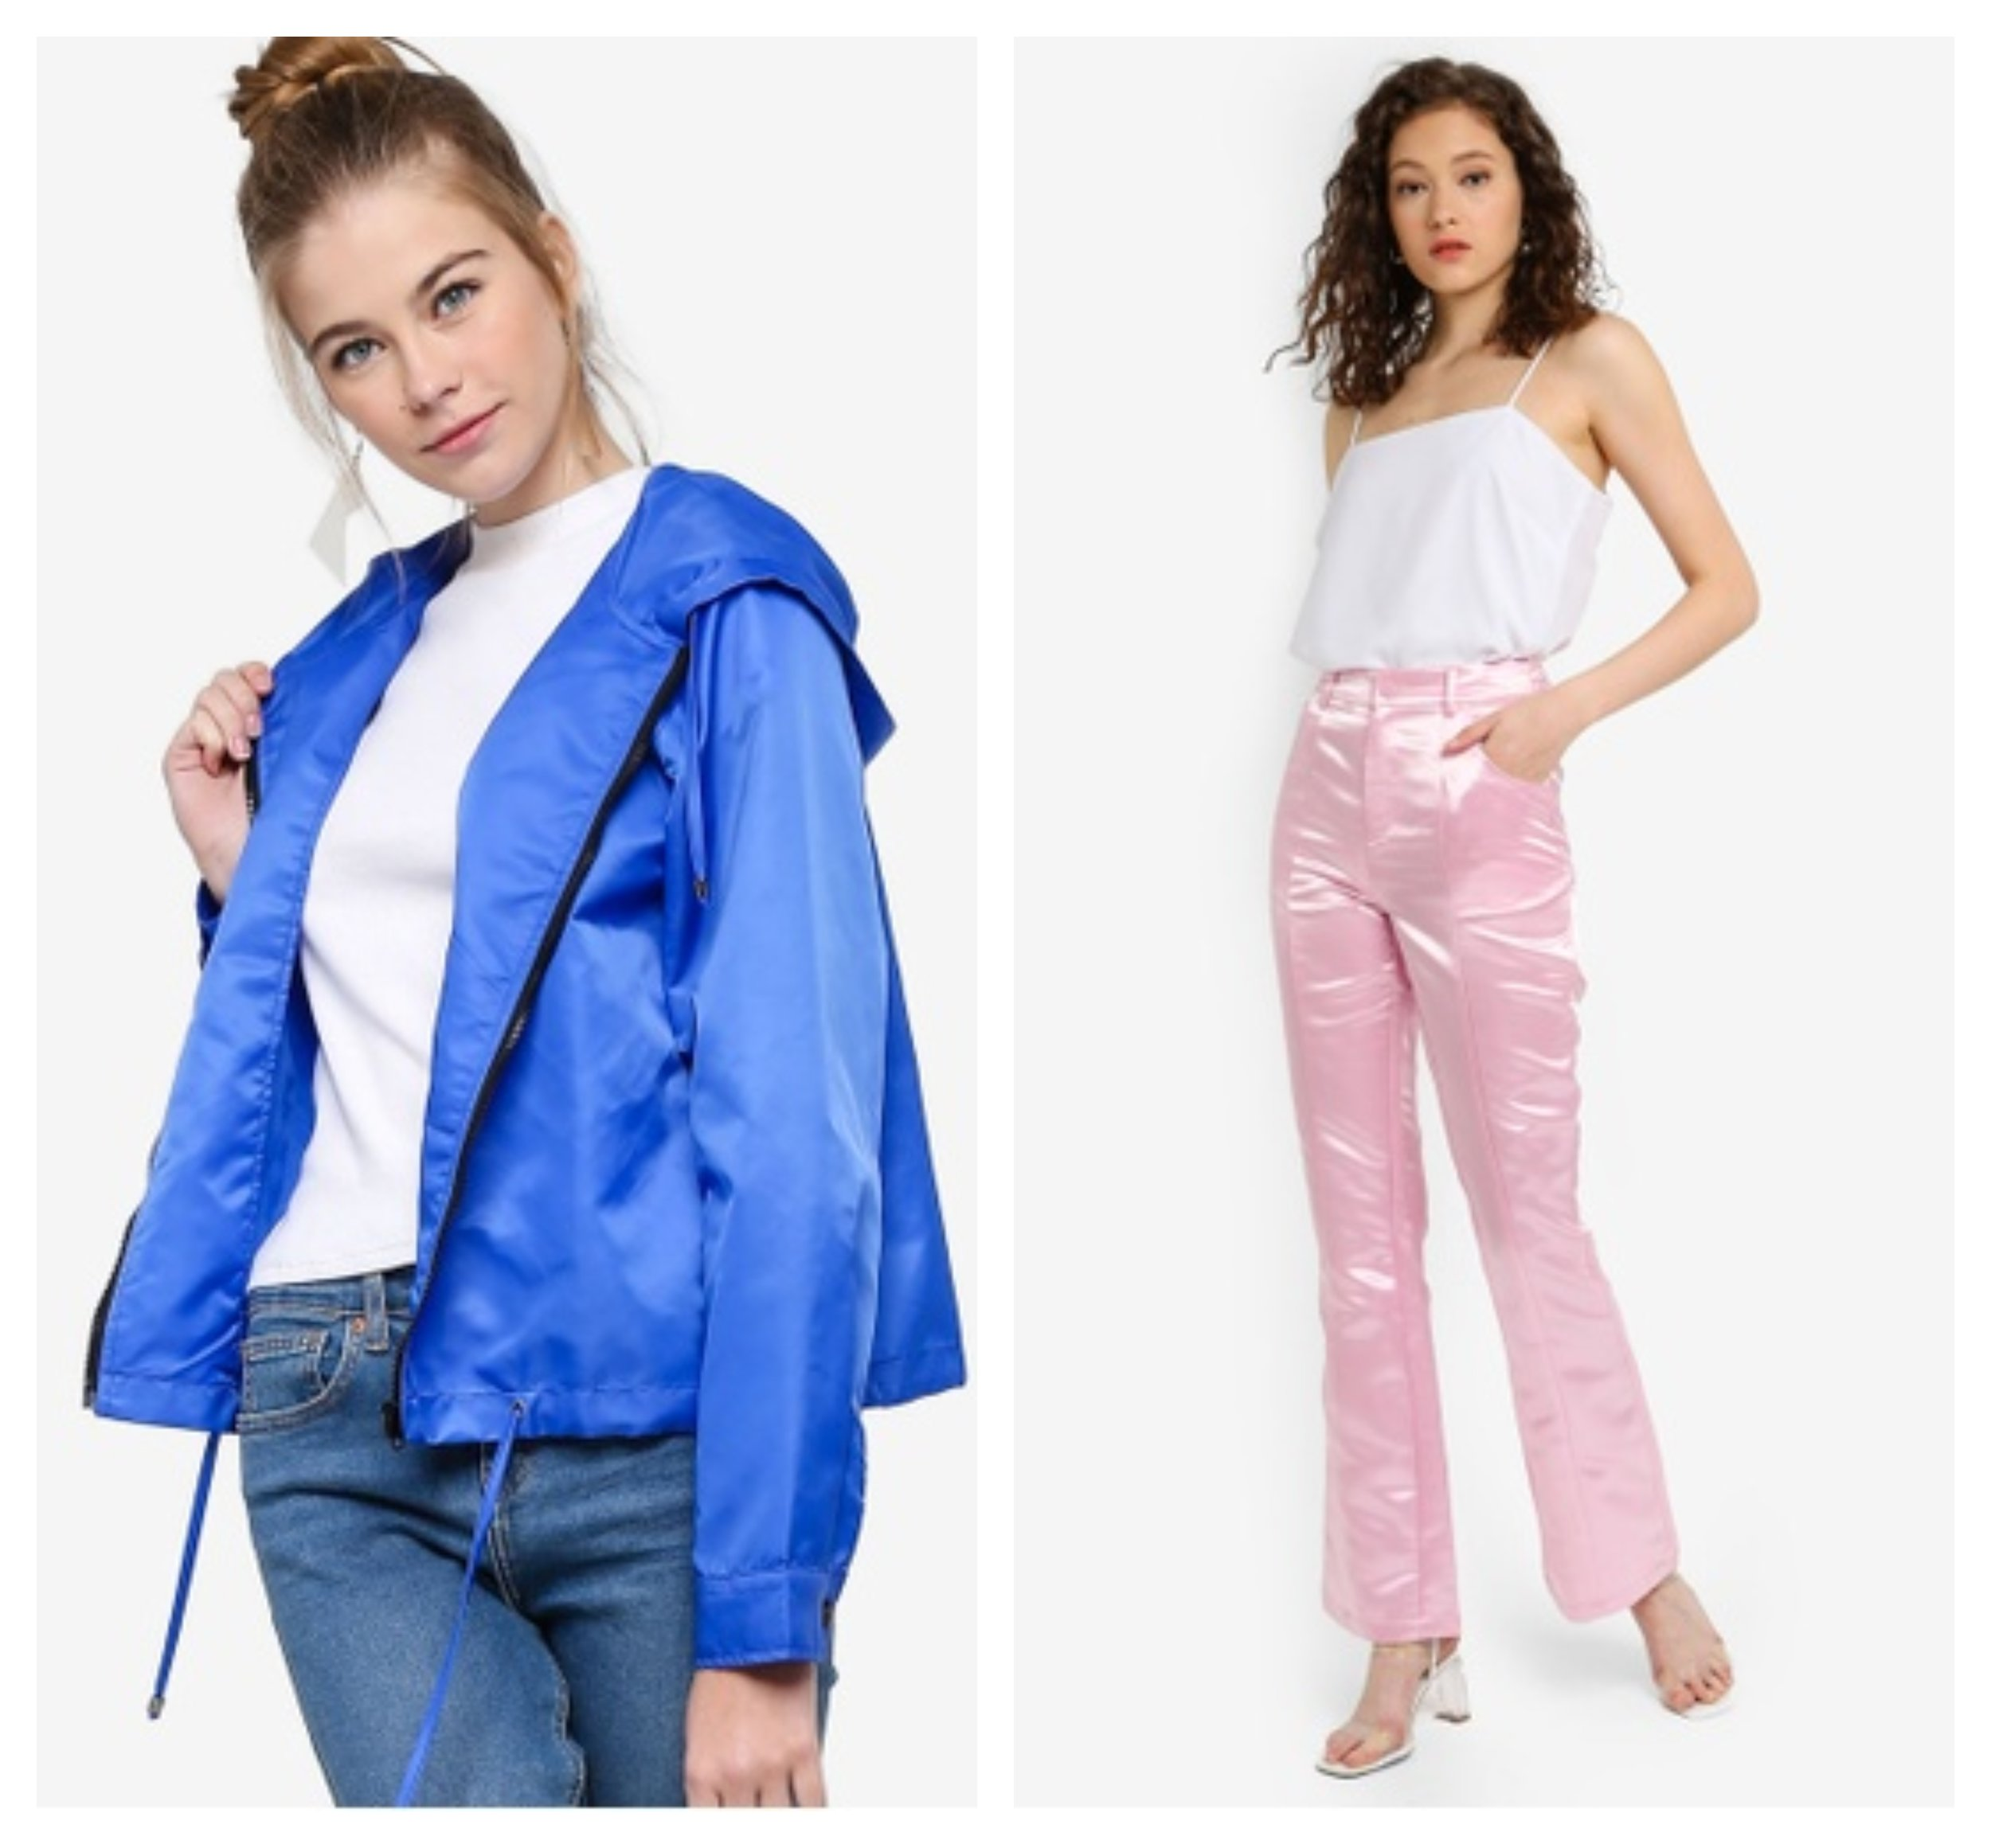 Something Borrowed Contrast Trim Lightweight Jacket  &  NA-KD Shiny Bootcut Pants